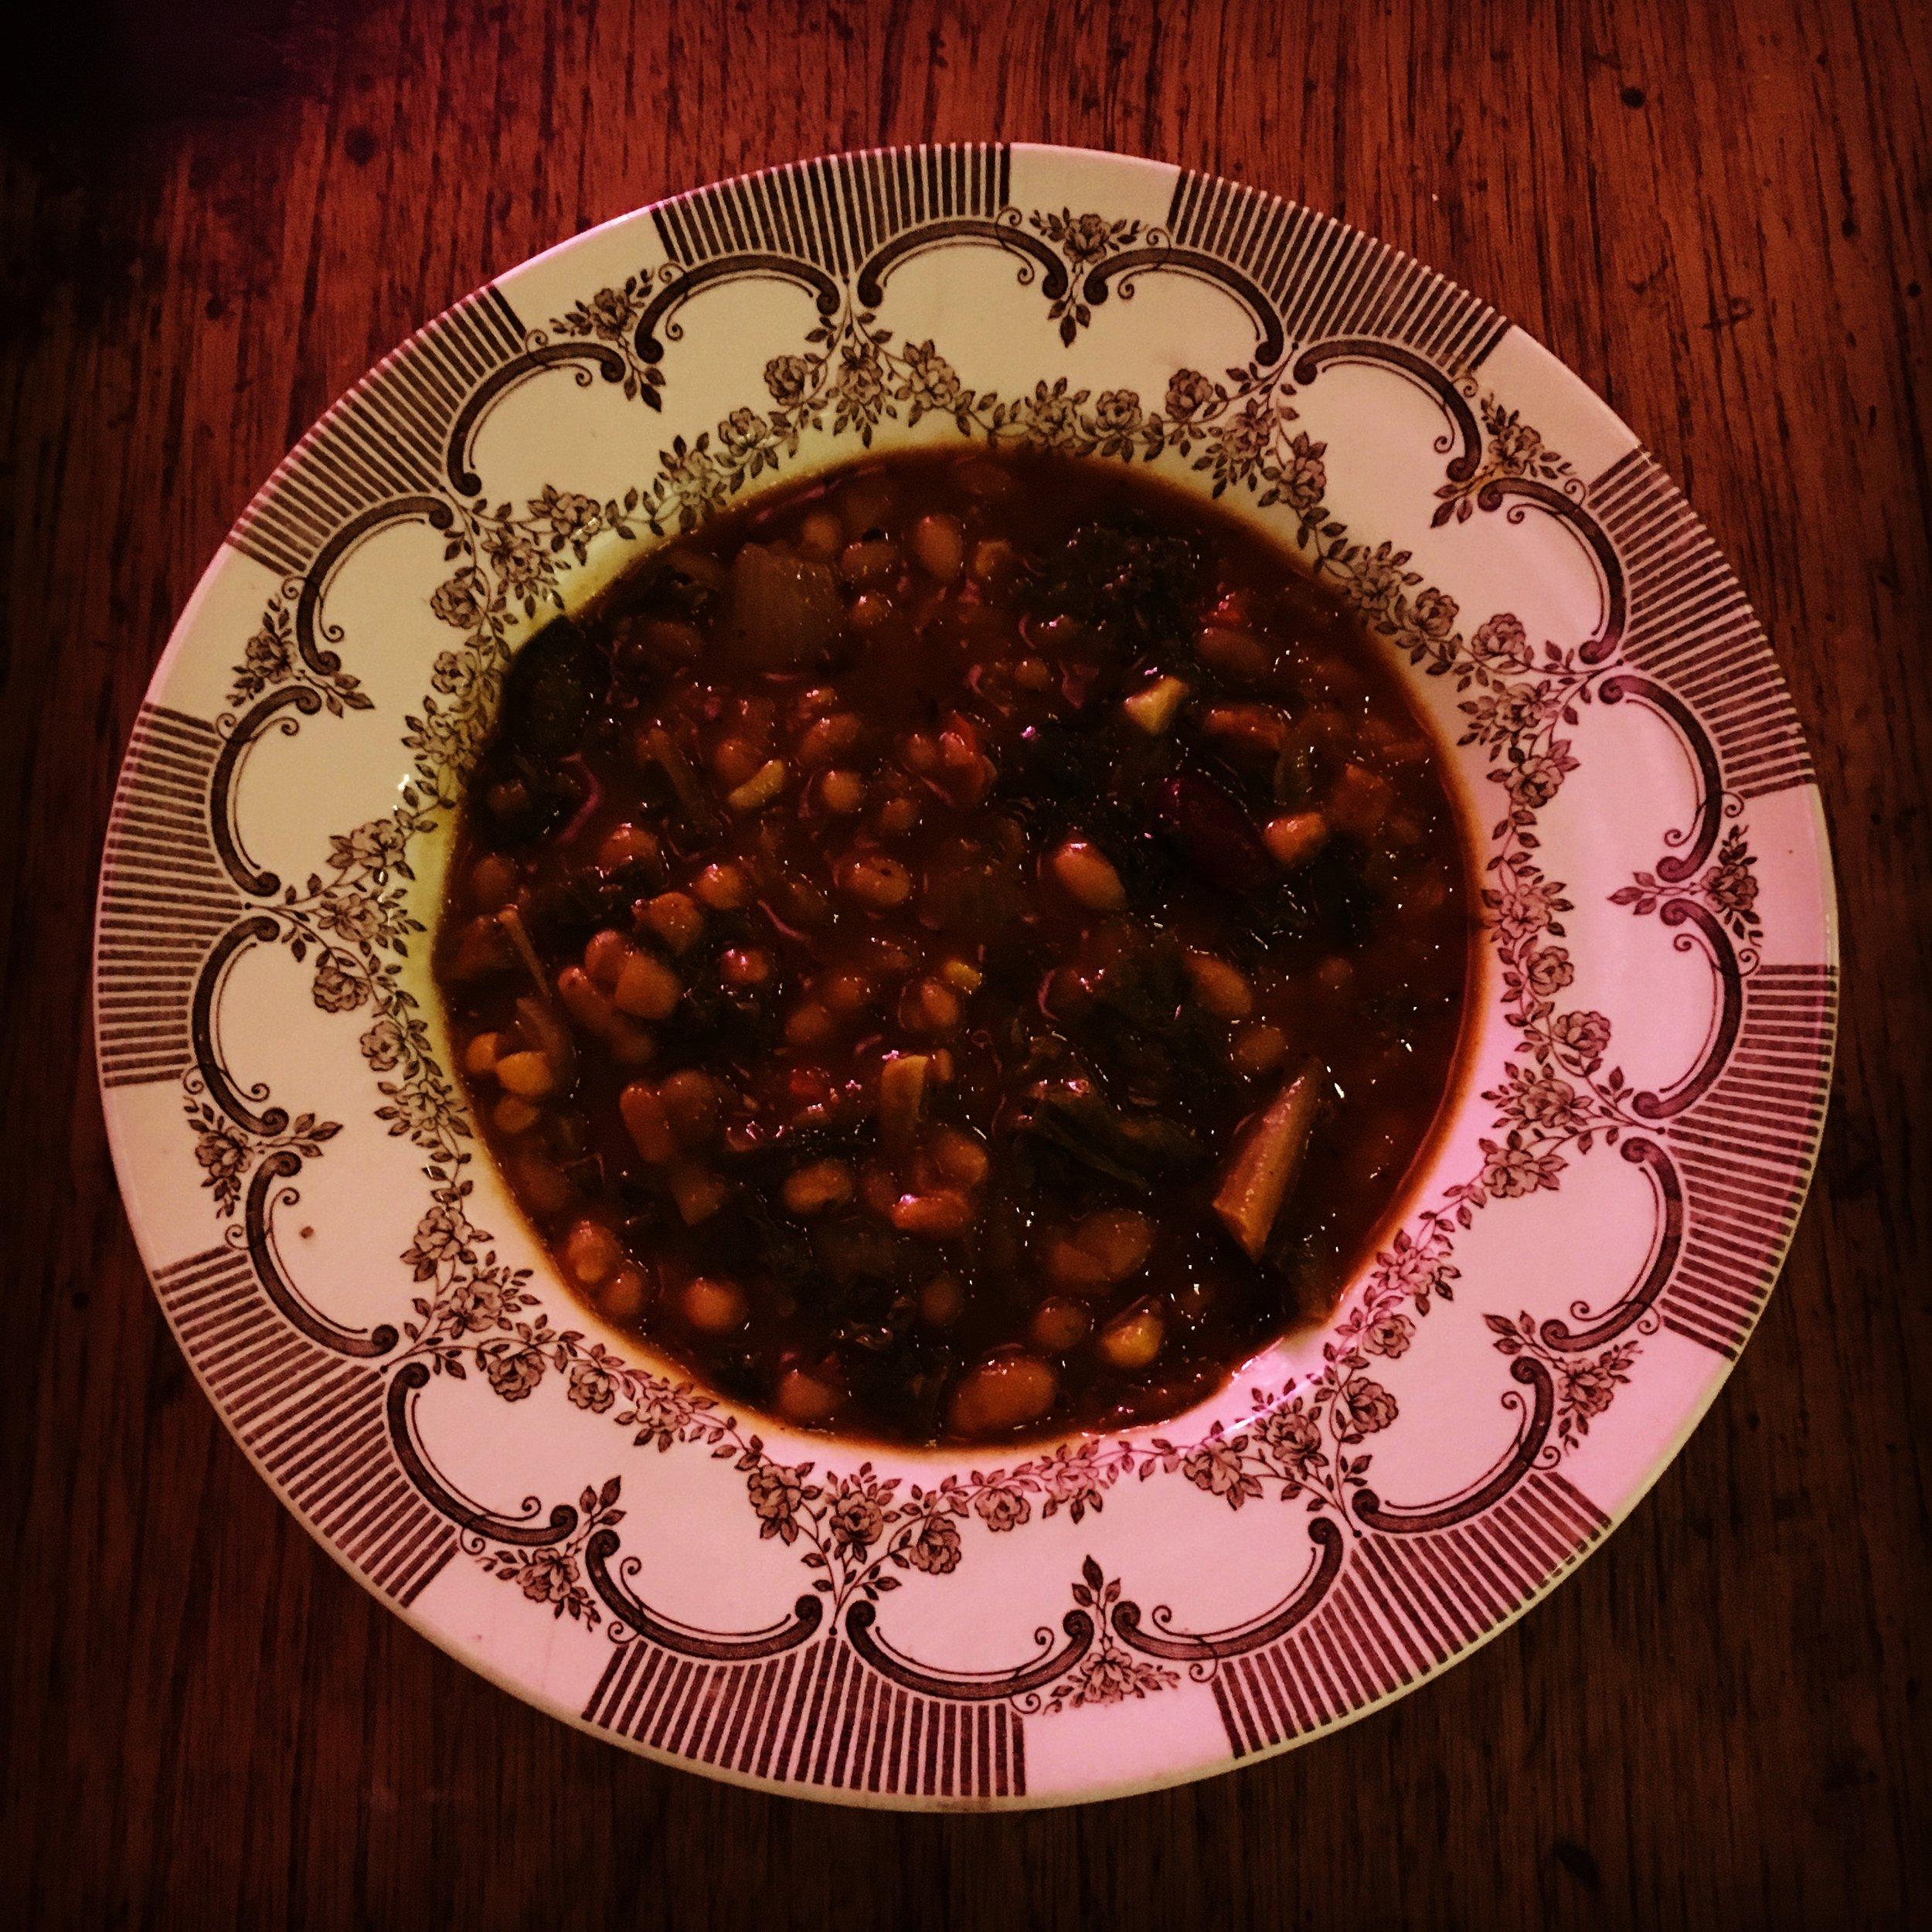 My spicy Boston Bean Stew - yum!